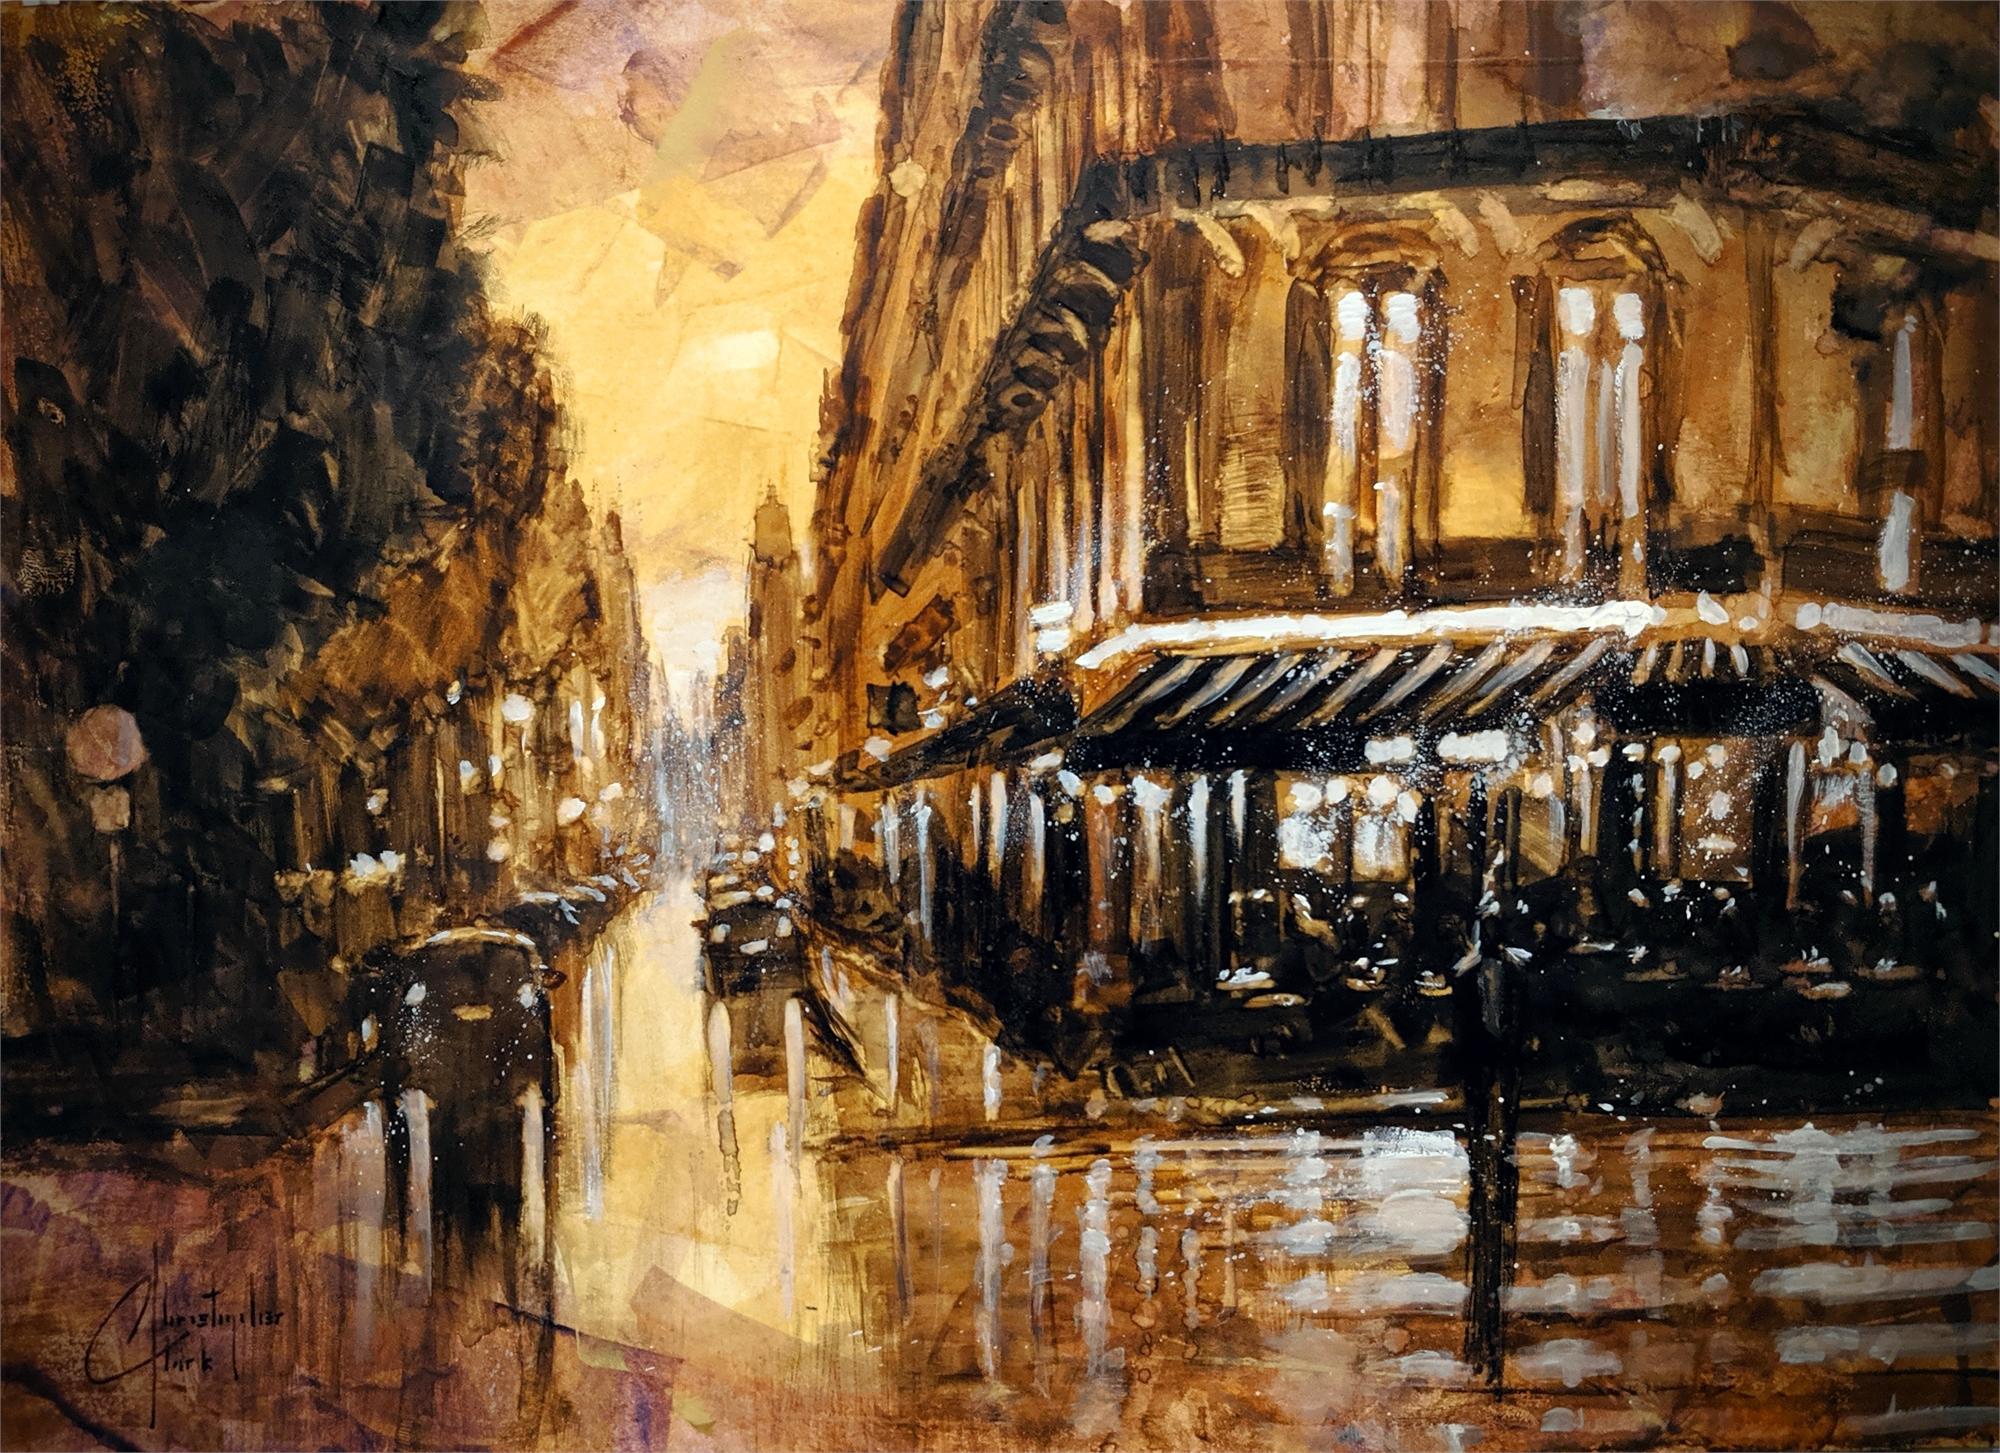 Sepia Tone, Paris III by Christopher Clark